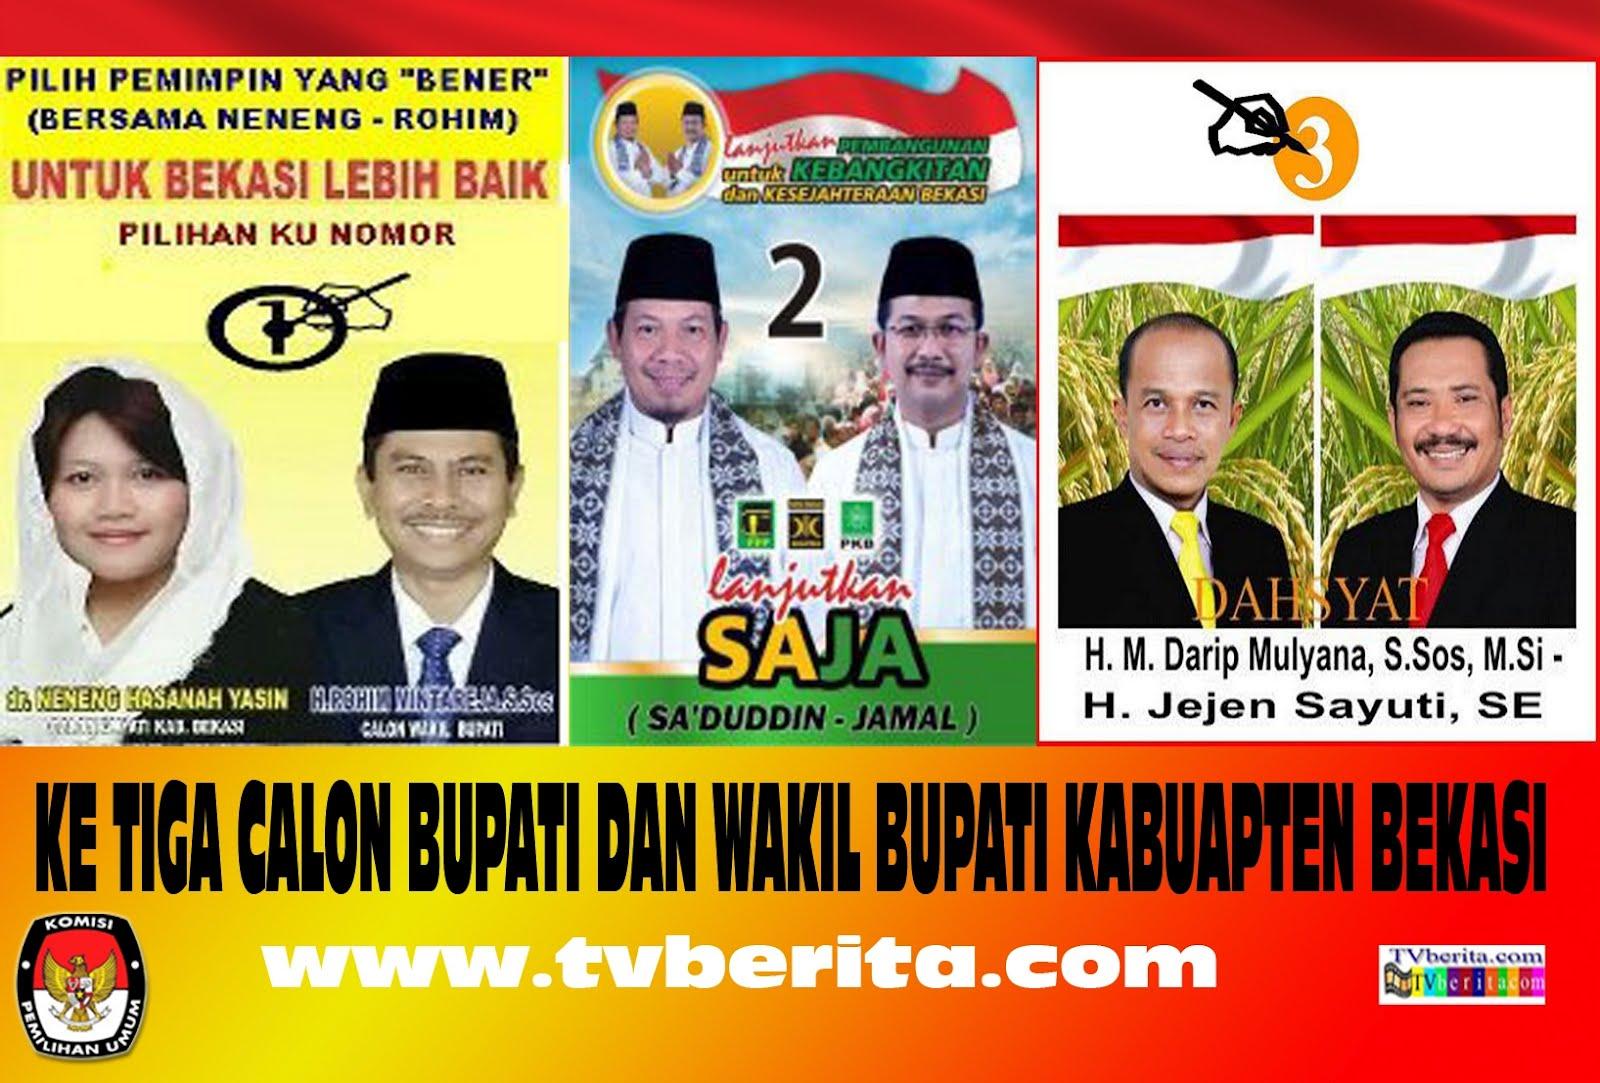 Debat Publik 3 Kandidat Calon Bupati Amp Wakil Bupati KabBekasi